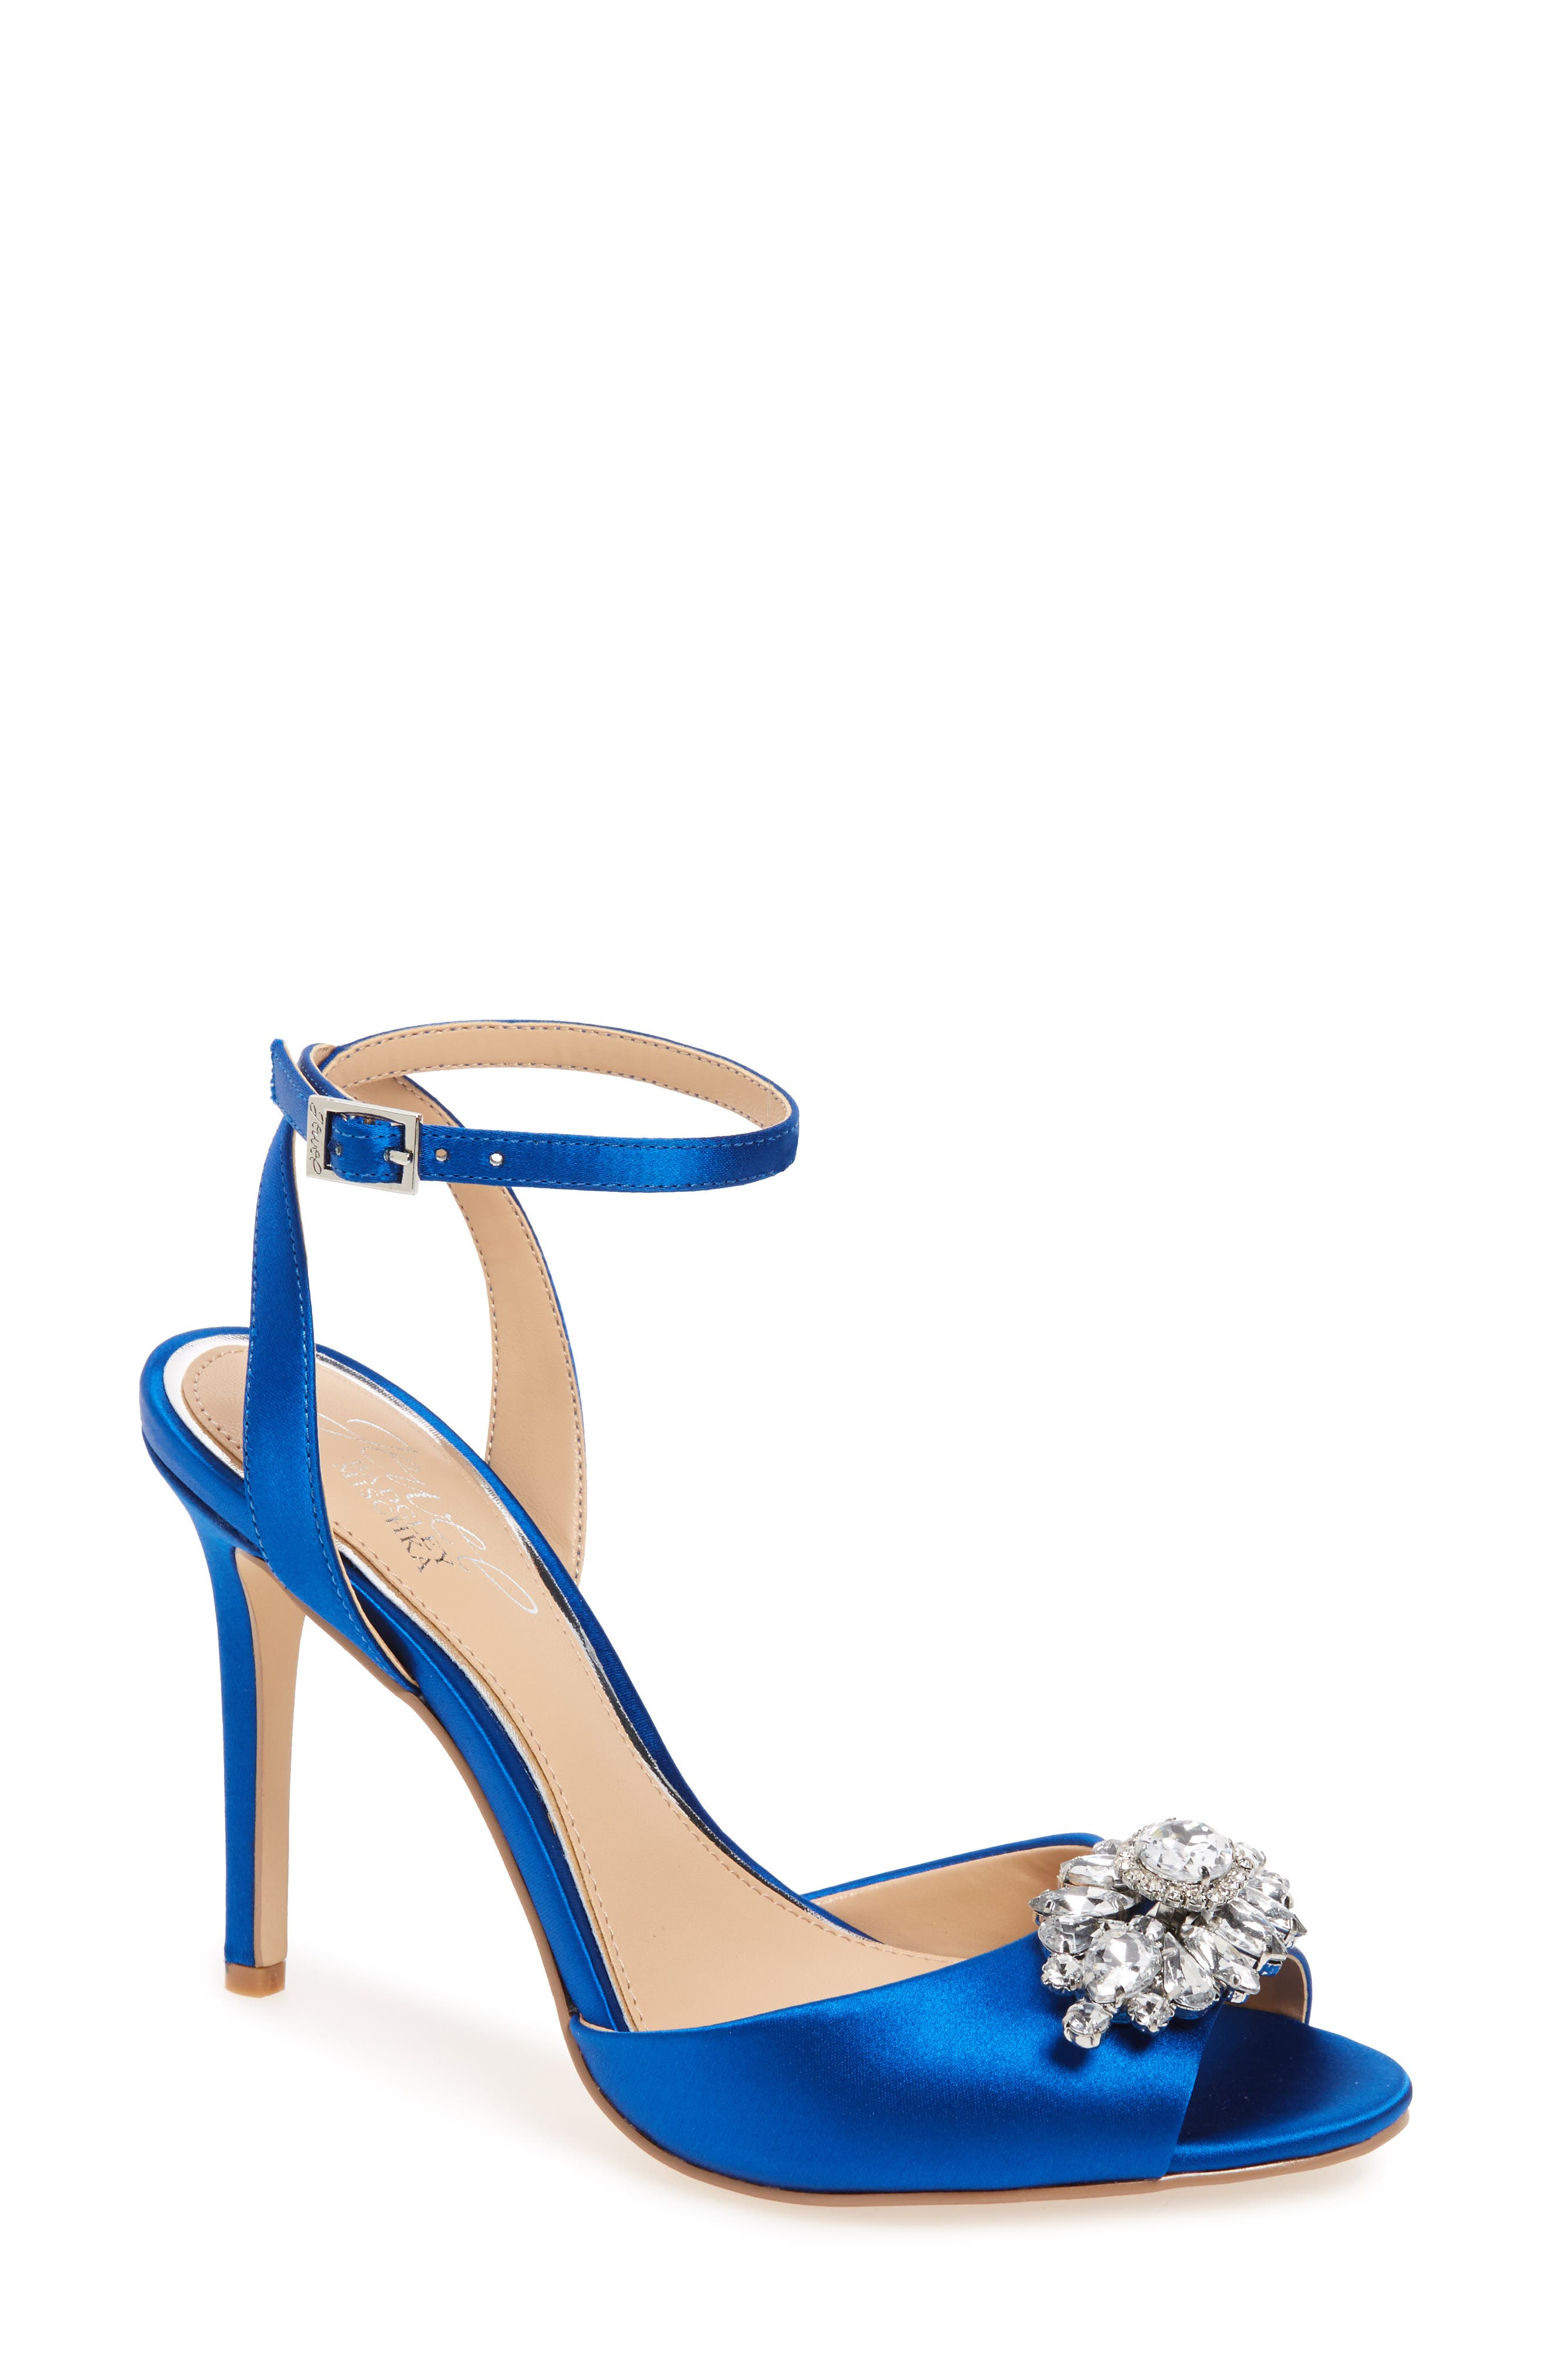 Royal Blue Sandals Heels Vqysf8jl